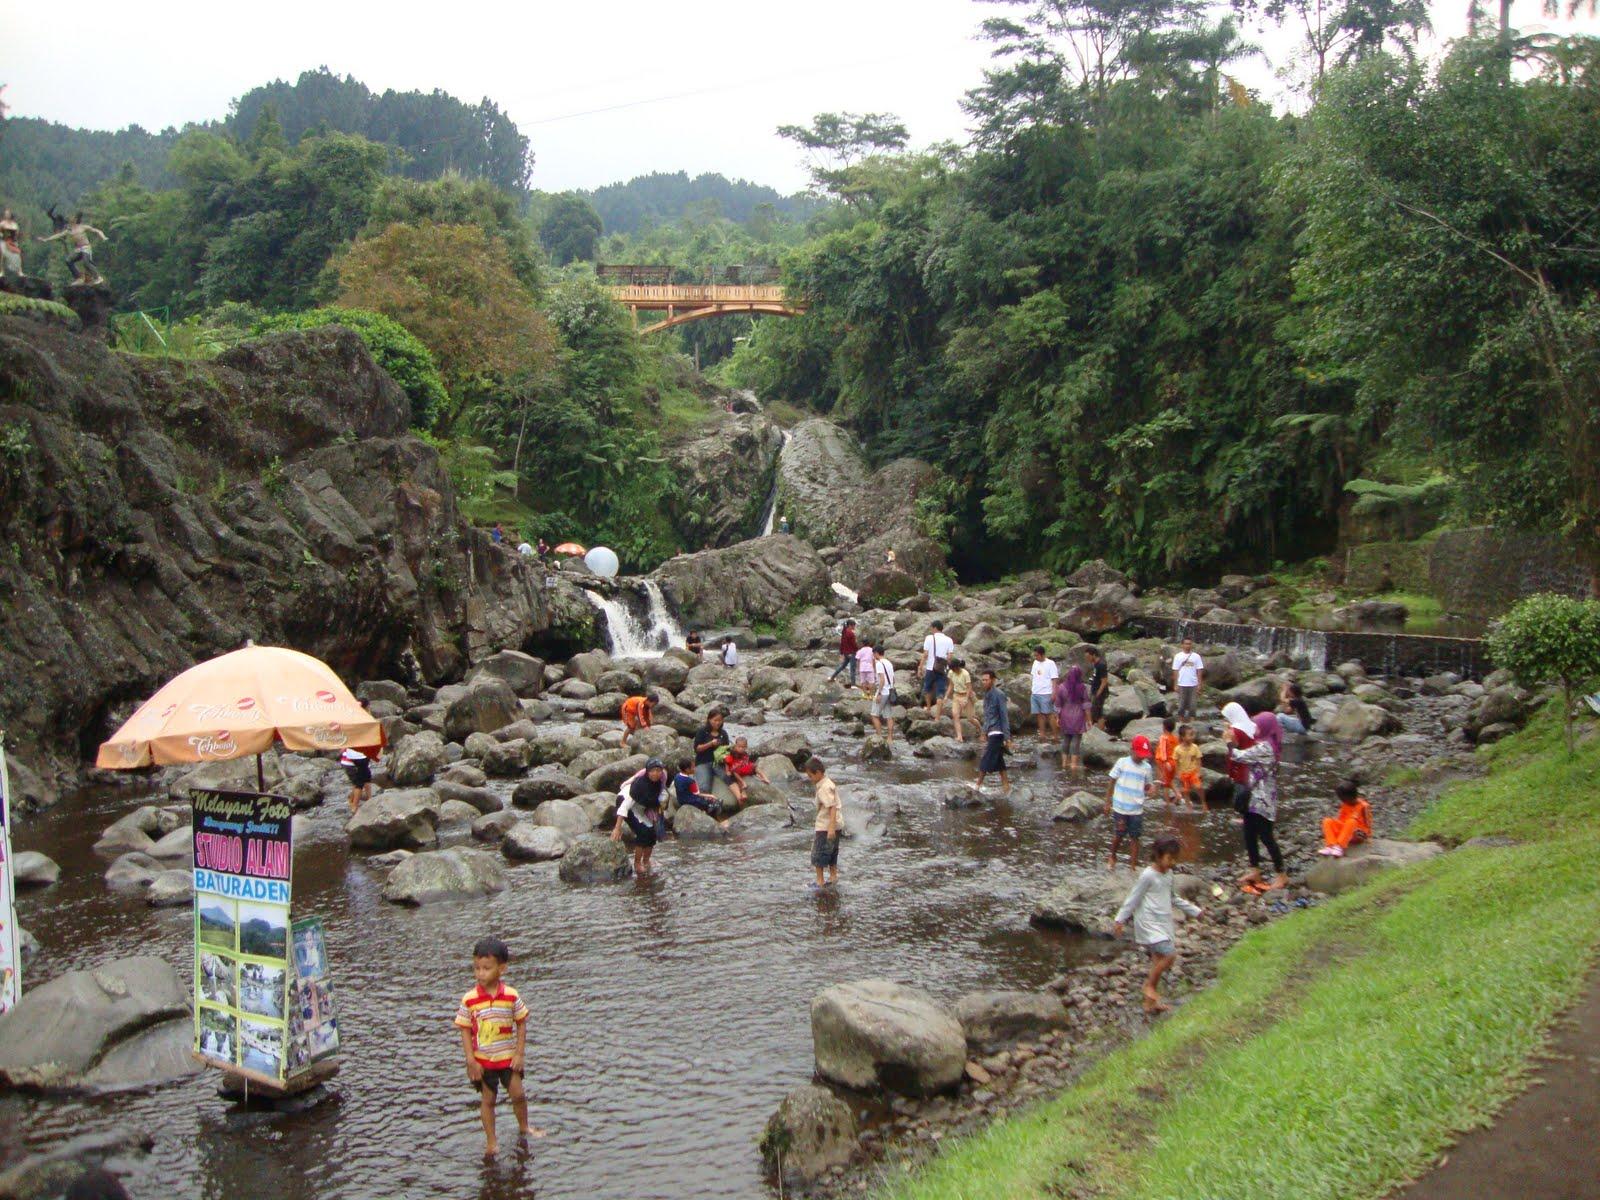 Wied Patikraja Pariwisata Banyumas Mandala Wisata Baturraden Kab